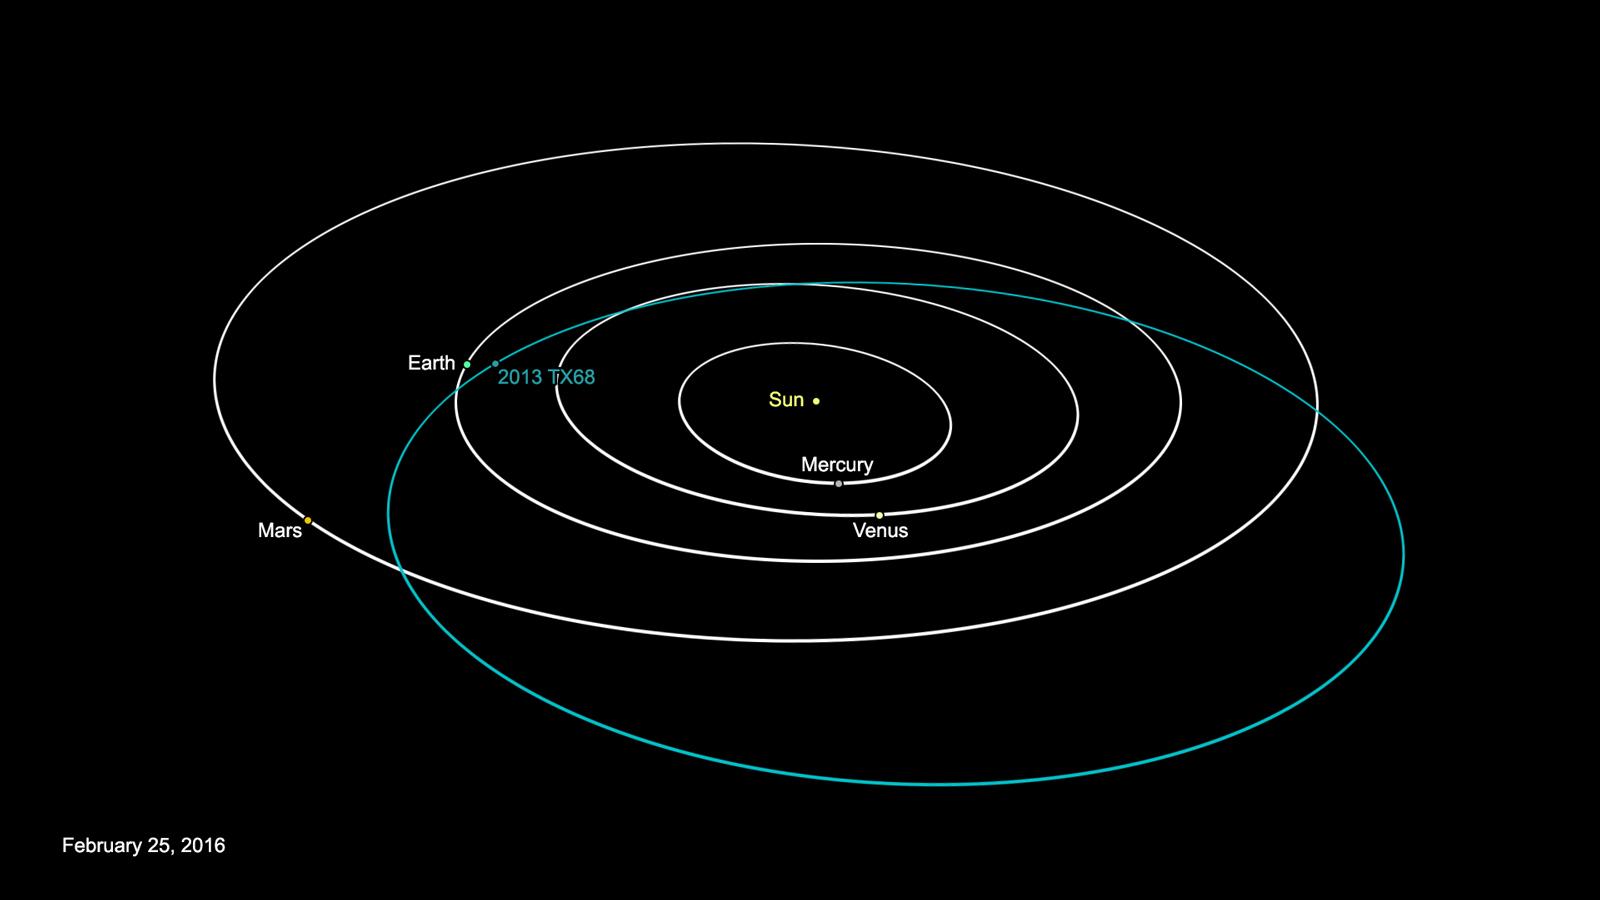 Орбита 2013 TX68. Рисунок: NASA/JPL-Caltech http://www.jpl.nasa.gov